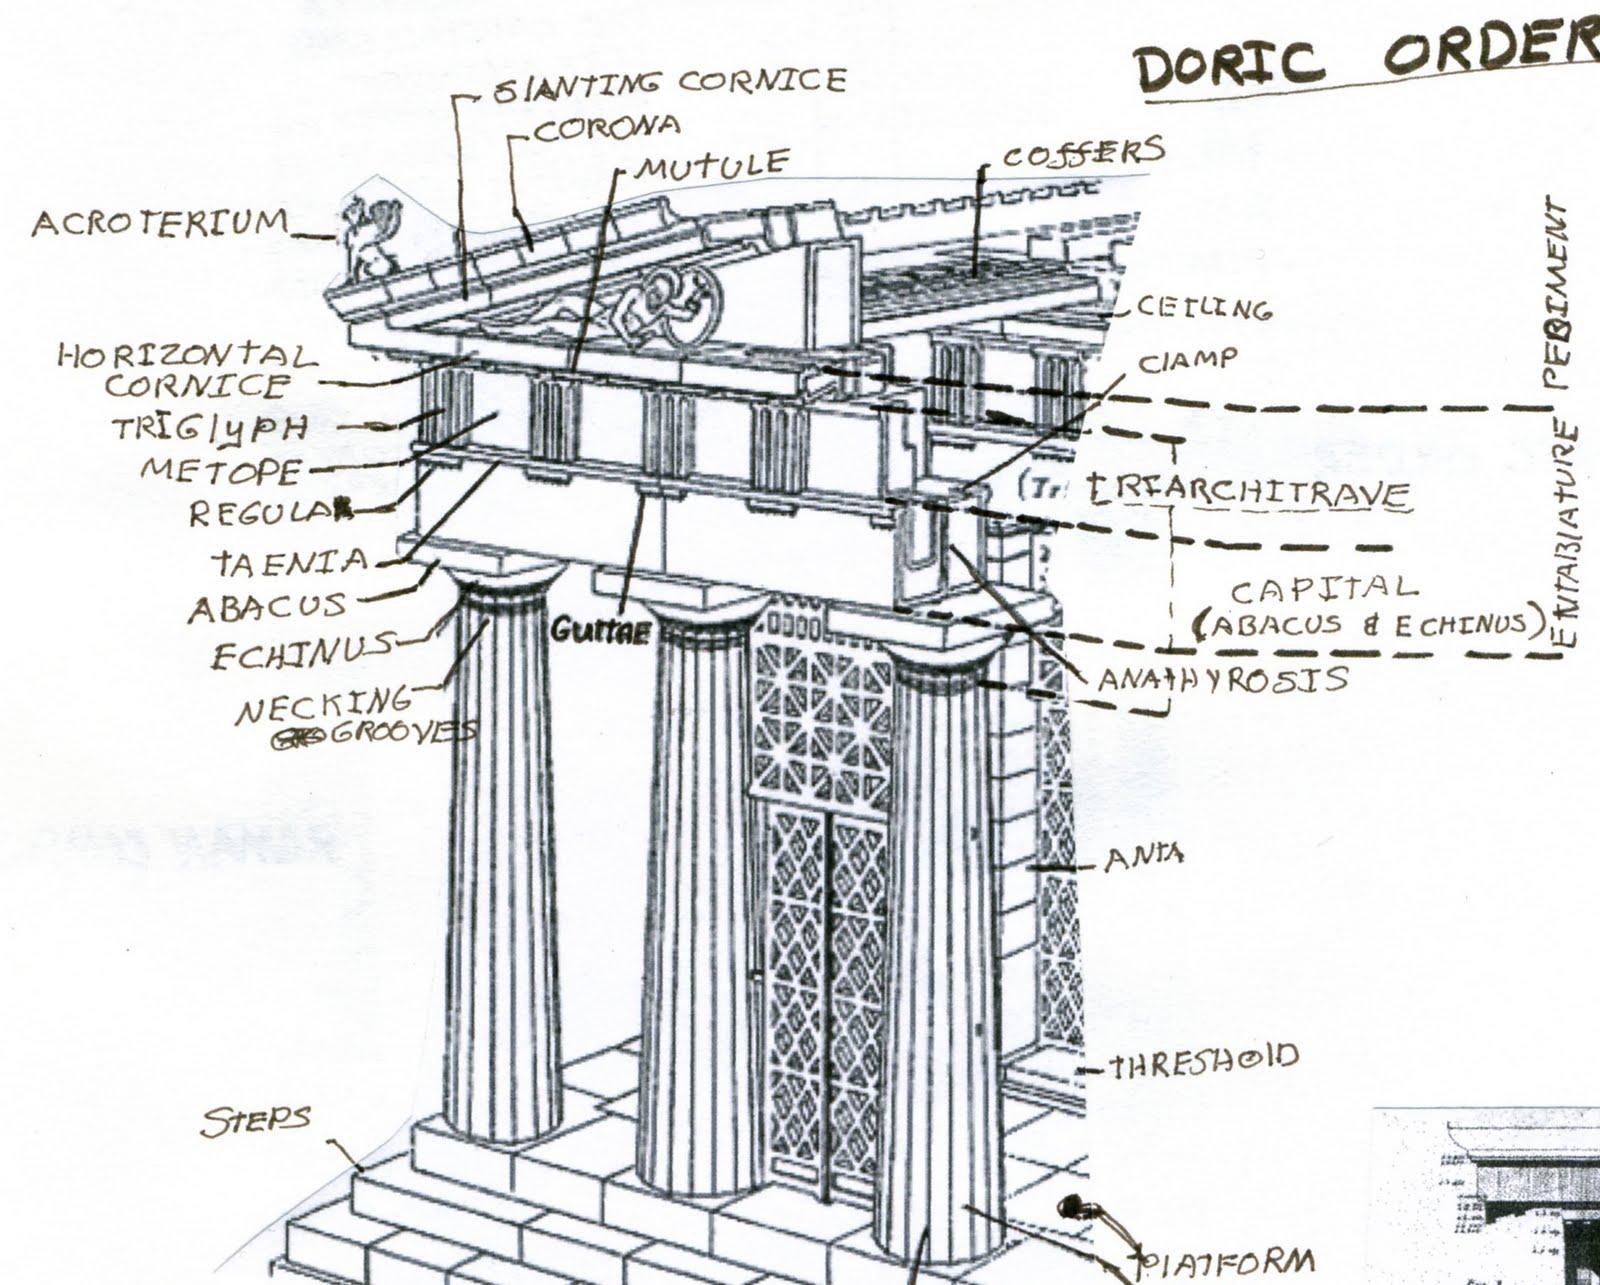 greek architecture diagram chrysler 3 8 serpentine belt doric order essay